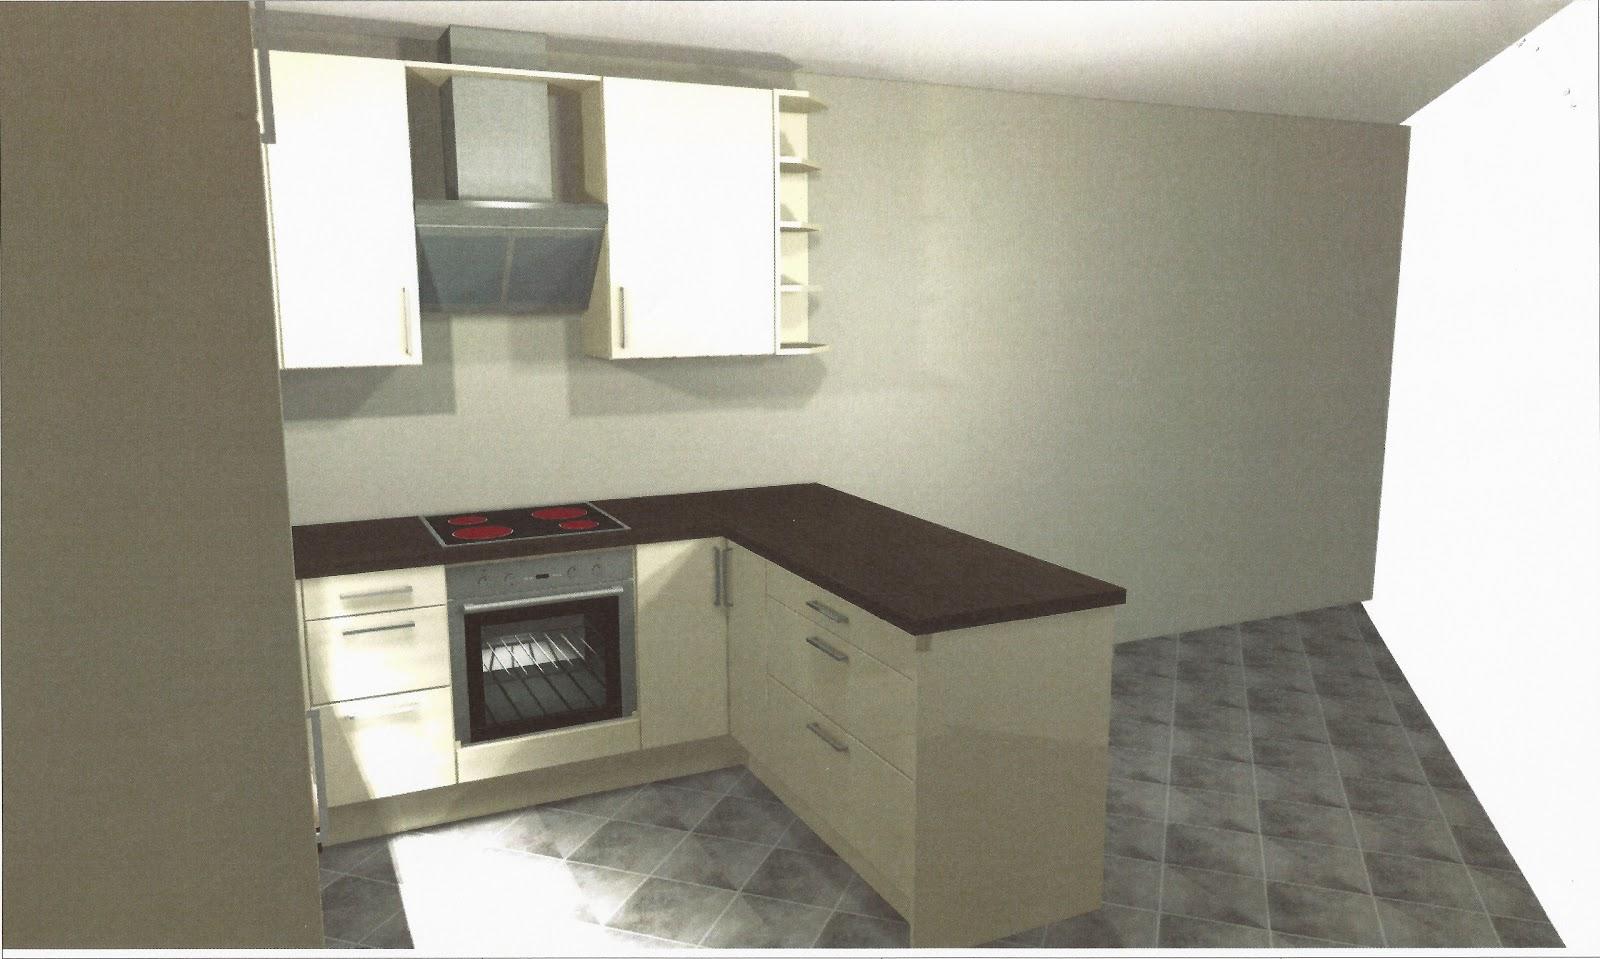 team massivhaus bautagebuch 2012 dezember januar k che. Black Bedroom Furniture Sets. Home Design Ideas